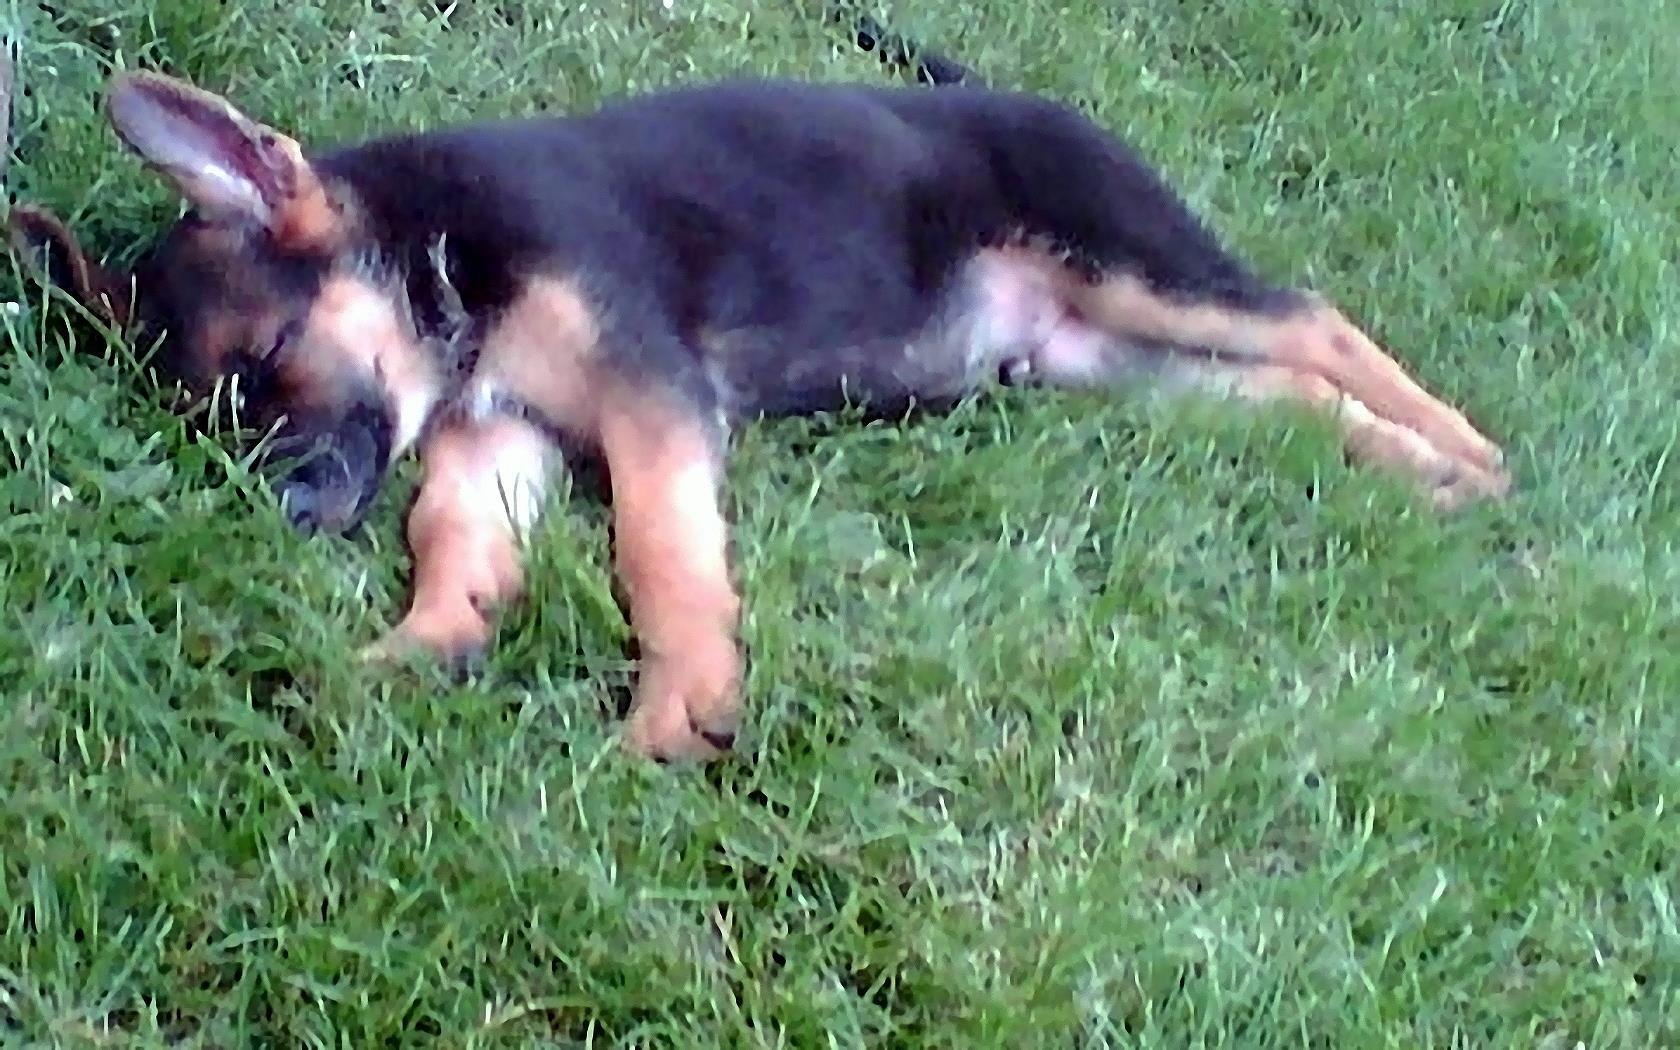 Hundebilder Hunde - kostenlose freie Bilder download